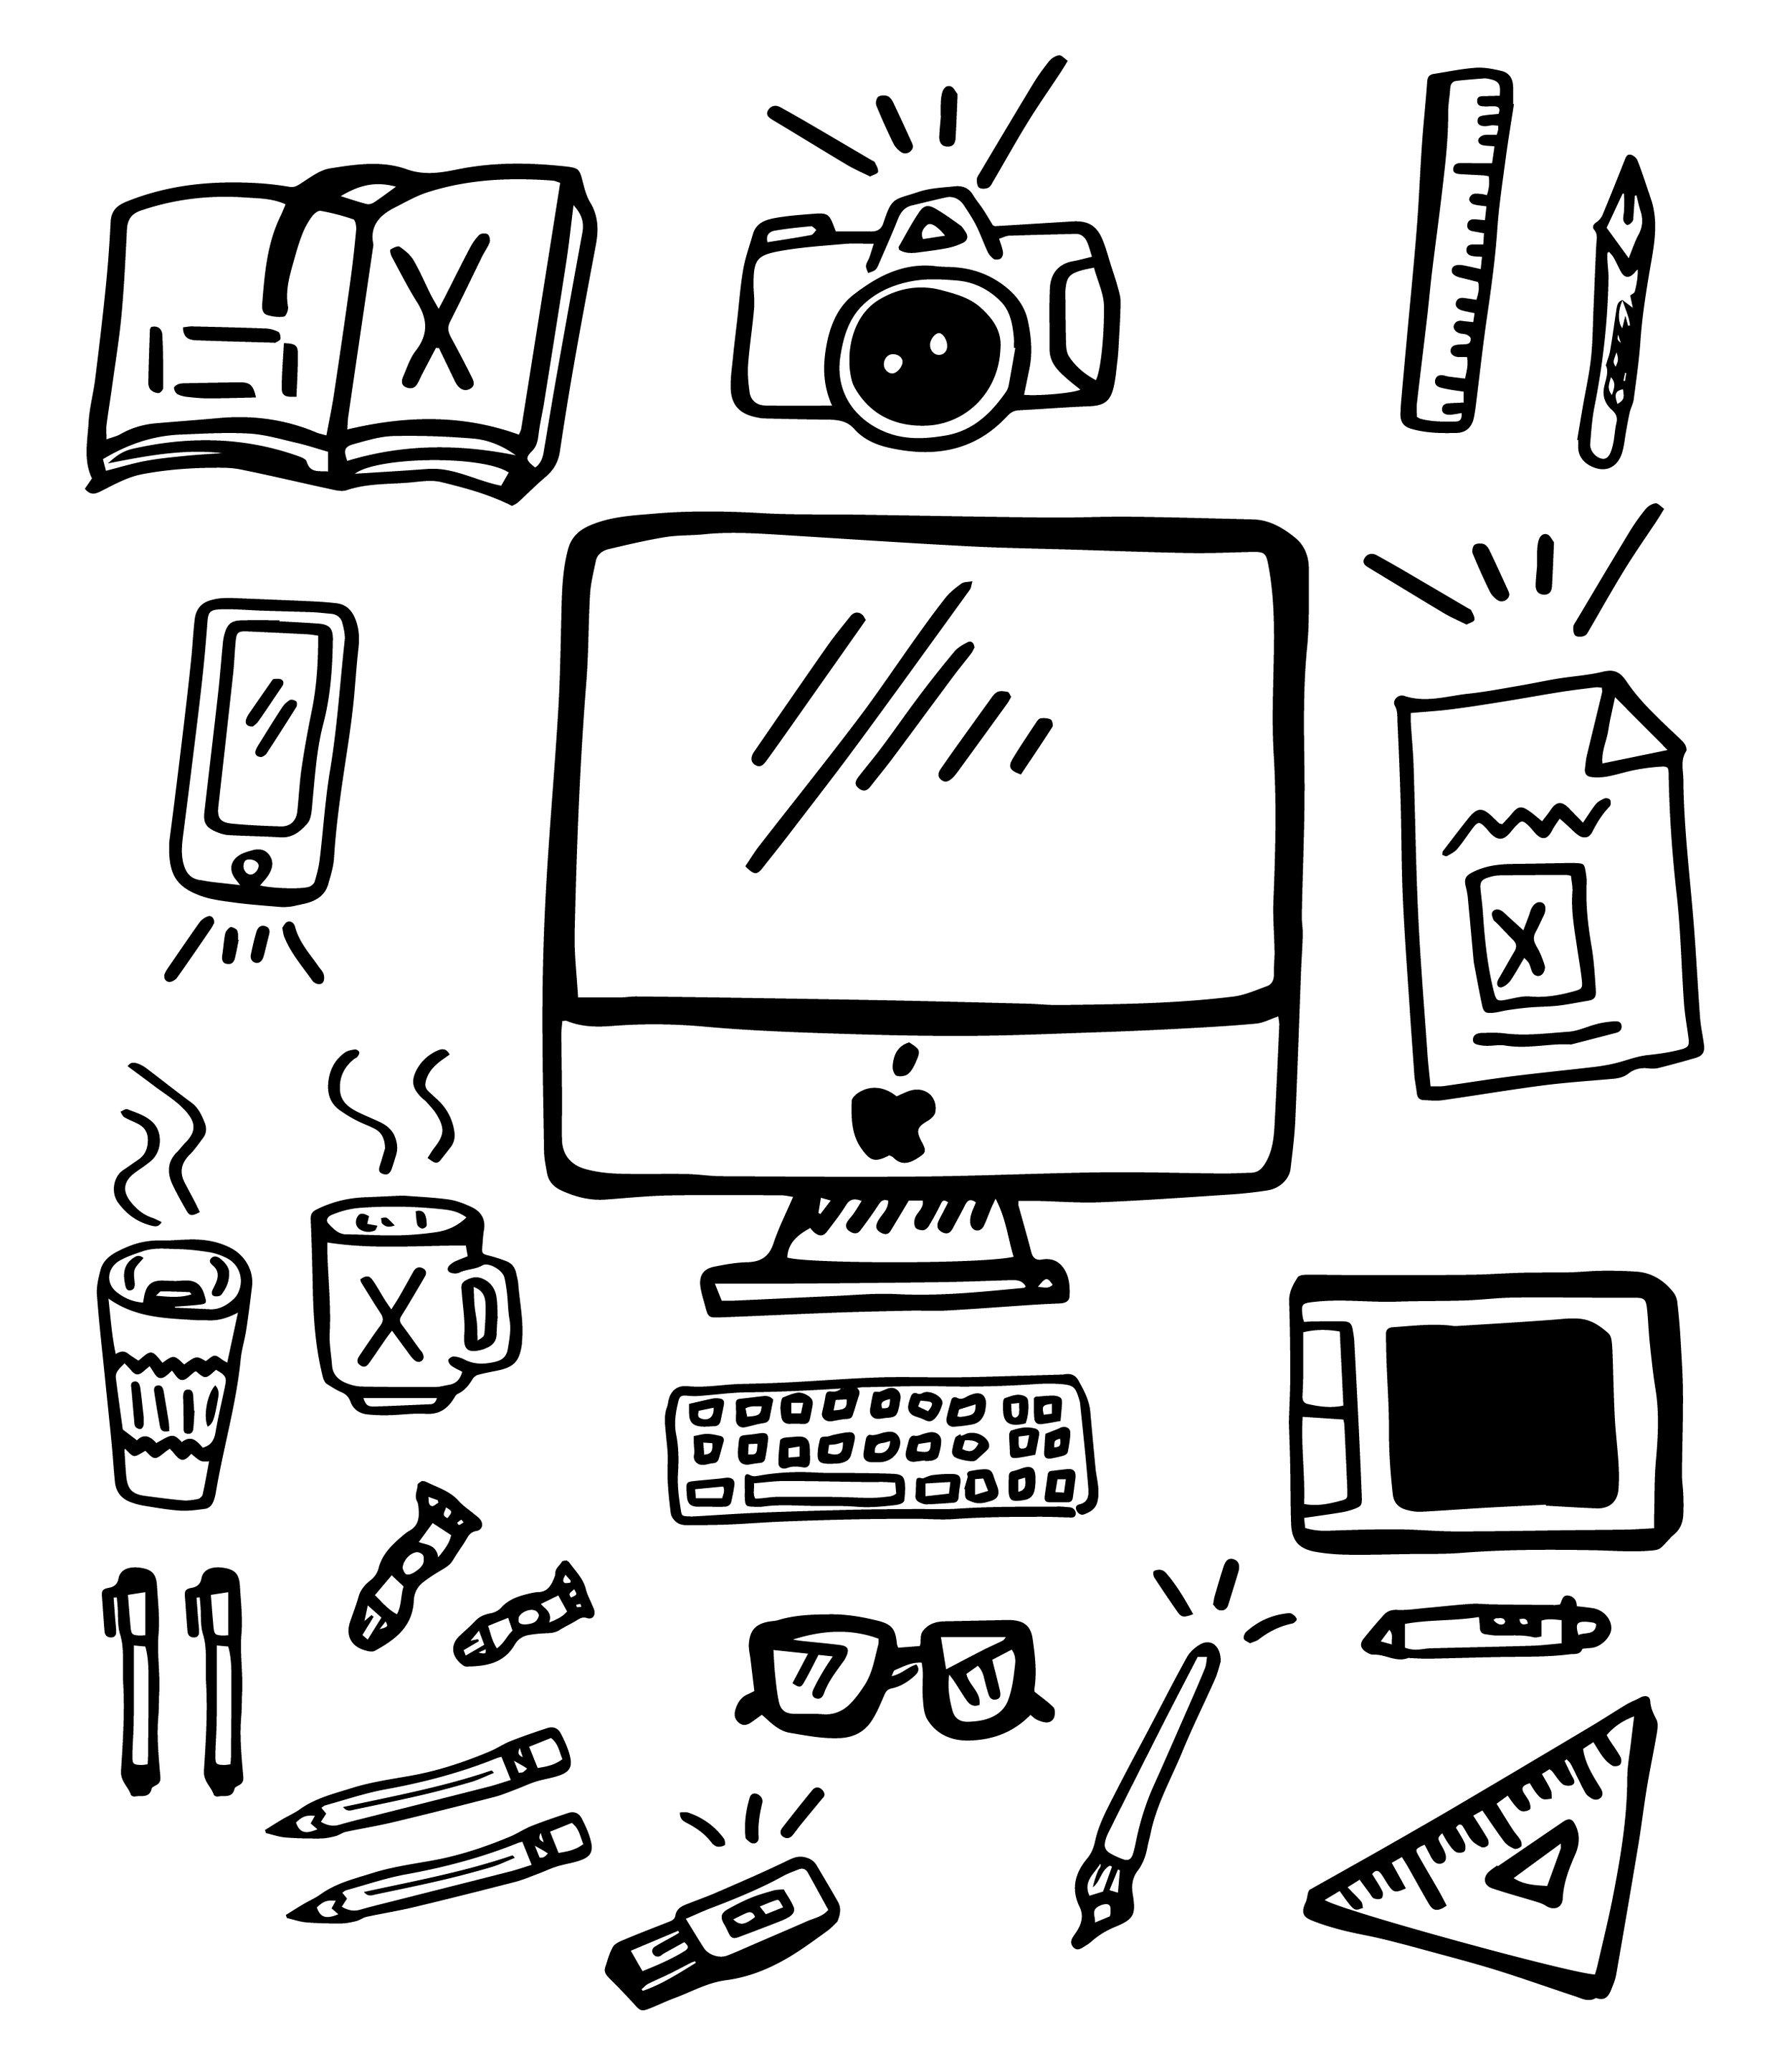 tools-01.jpg